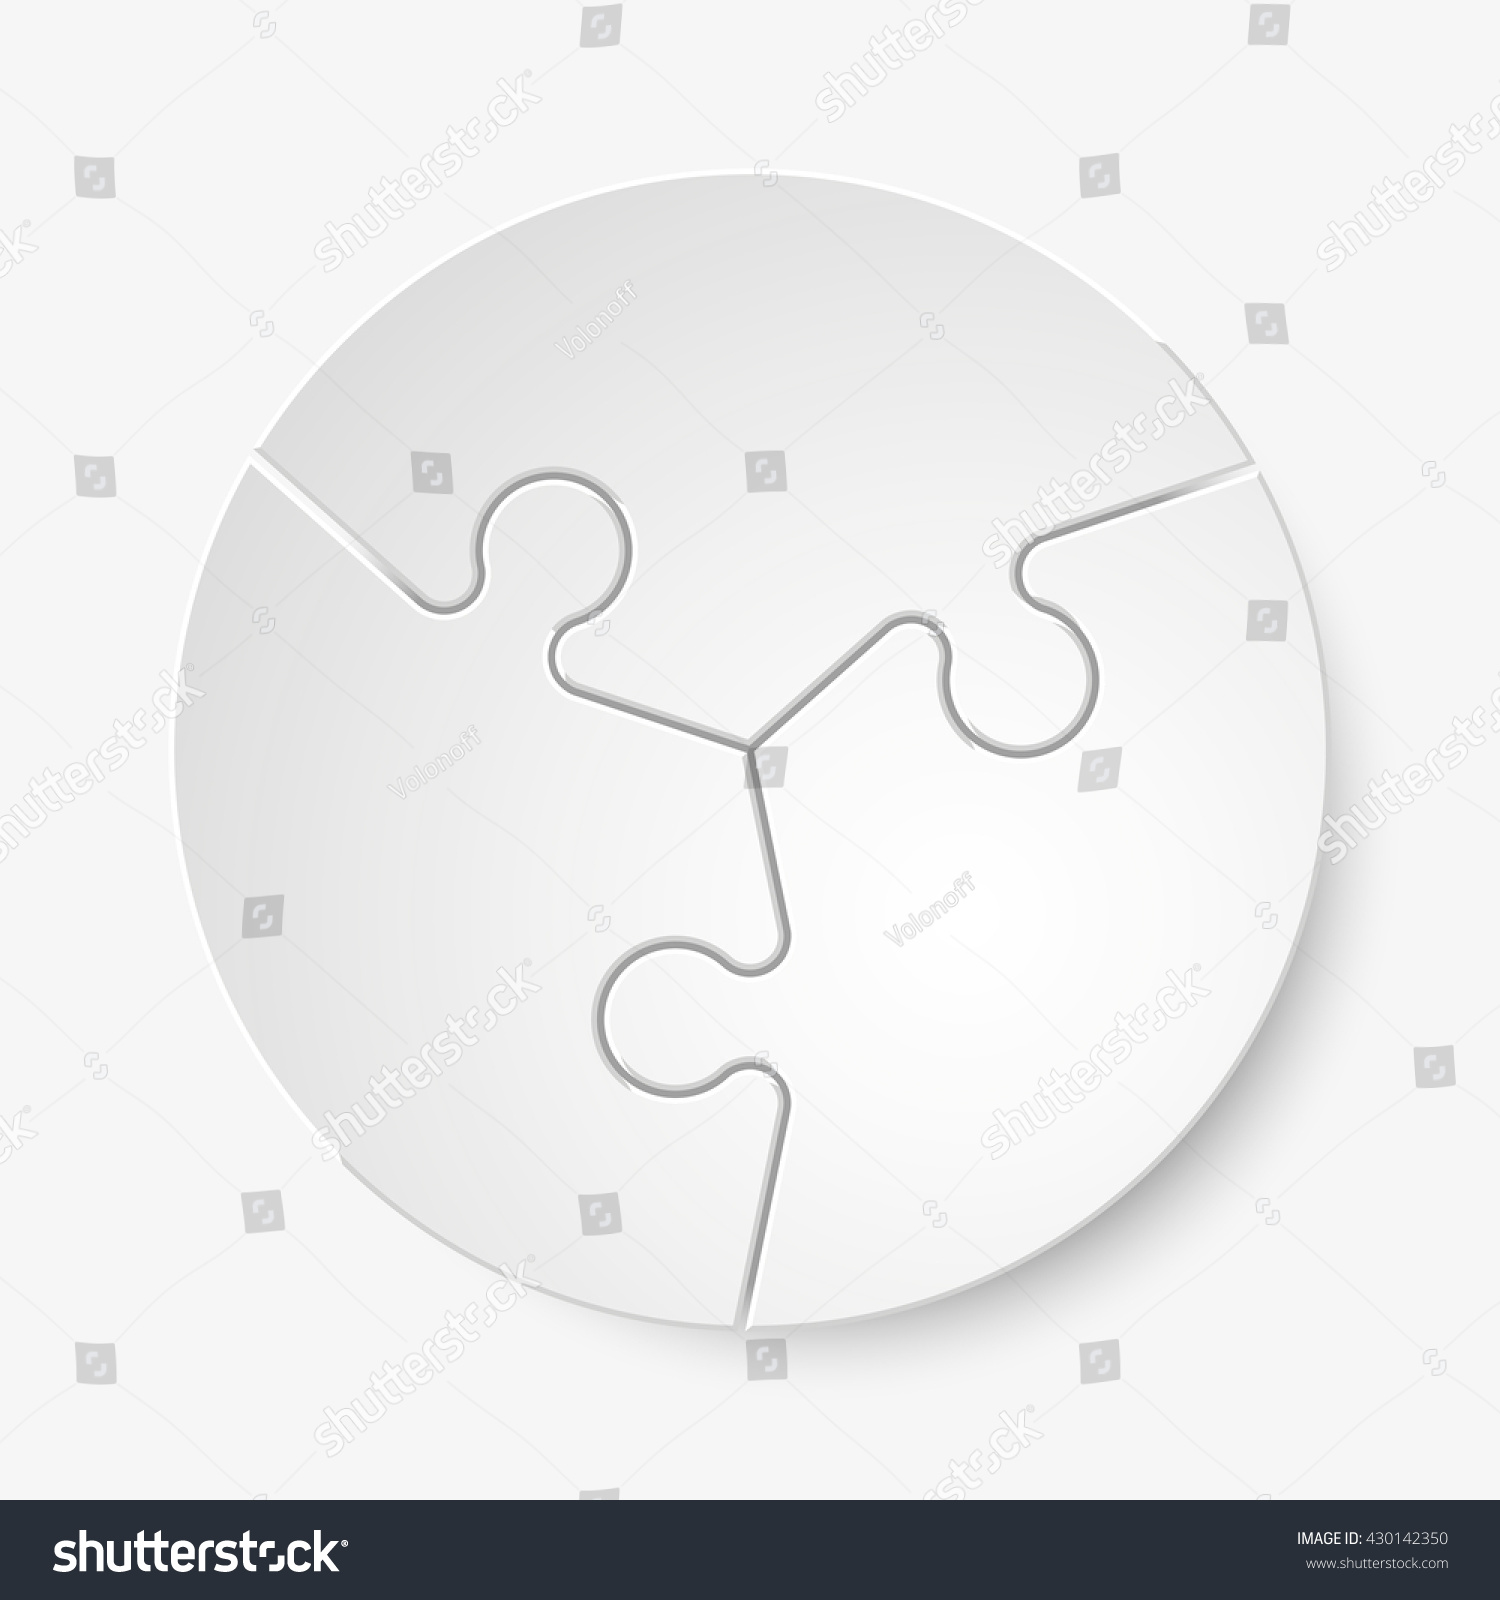 three piece flat puzzle round infographic stock illustration